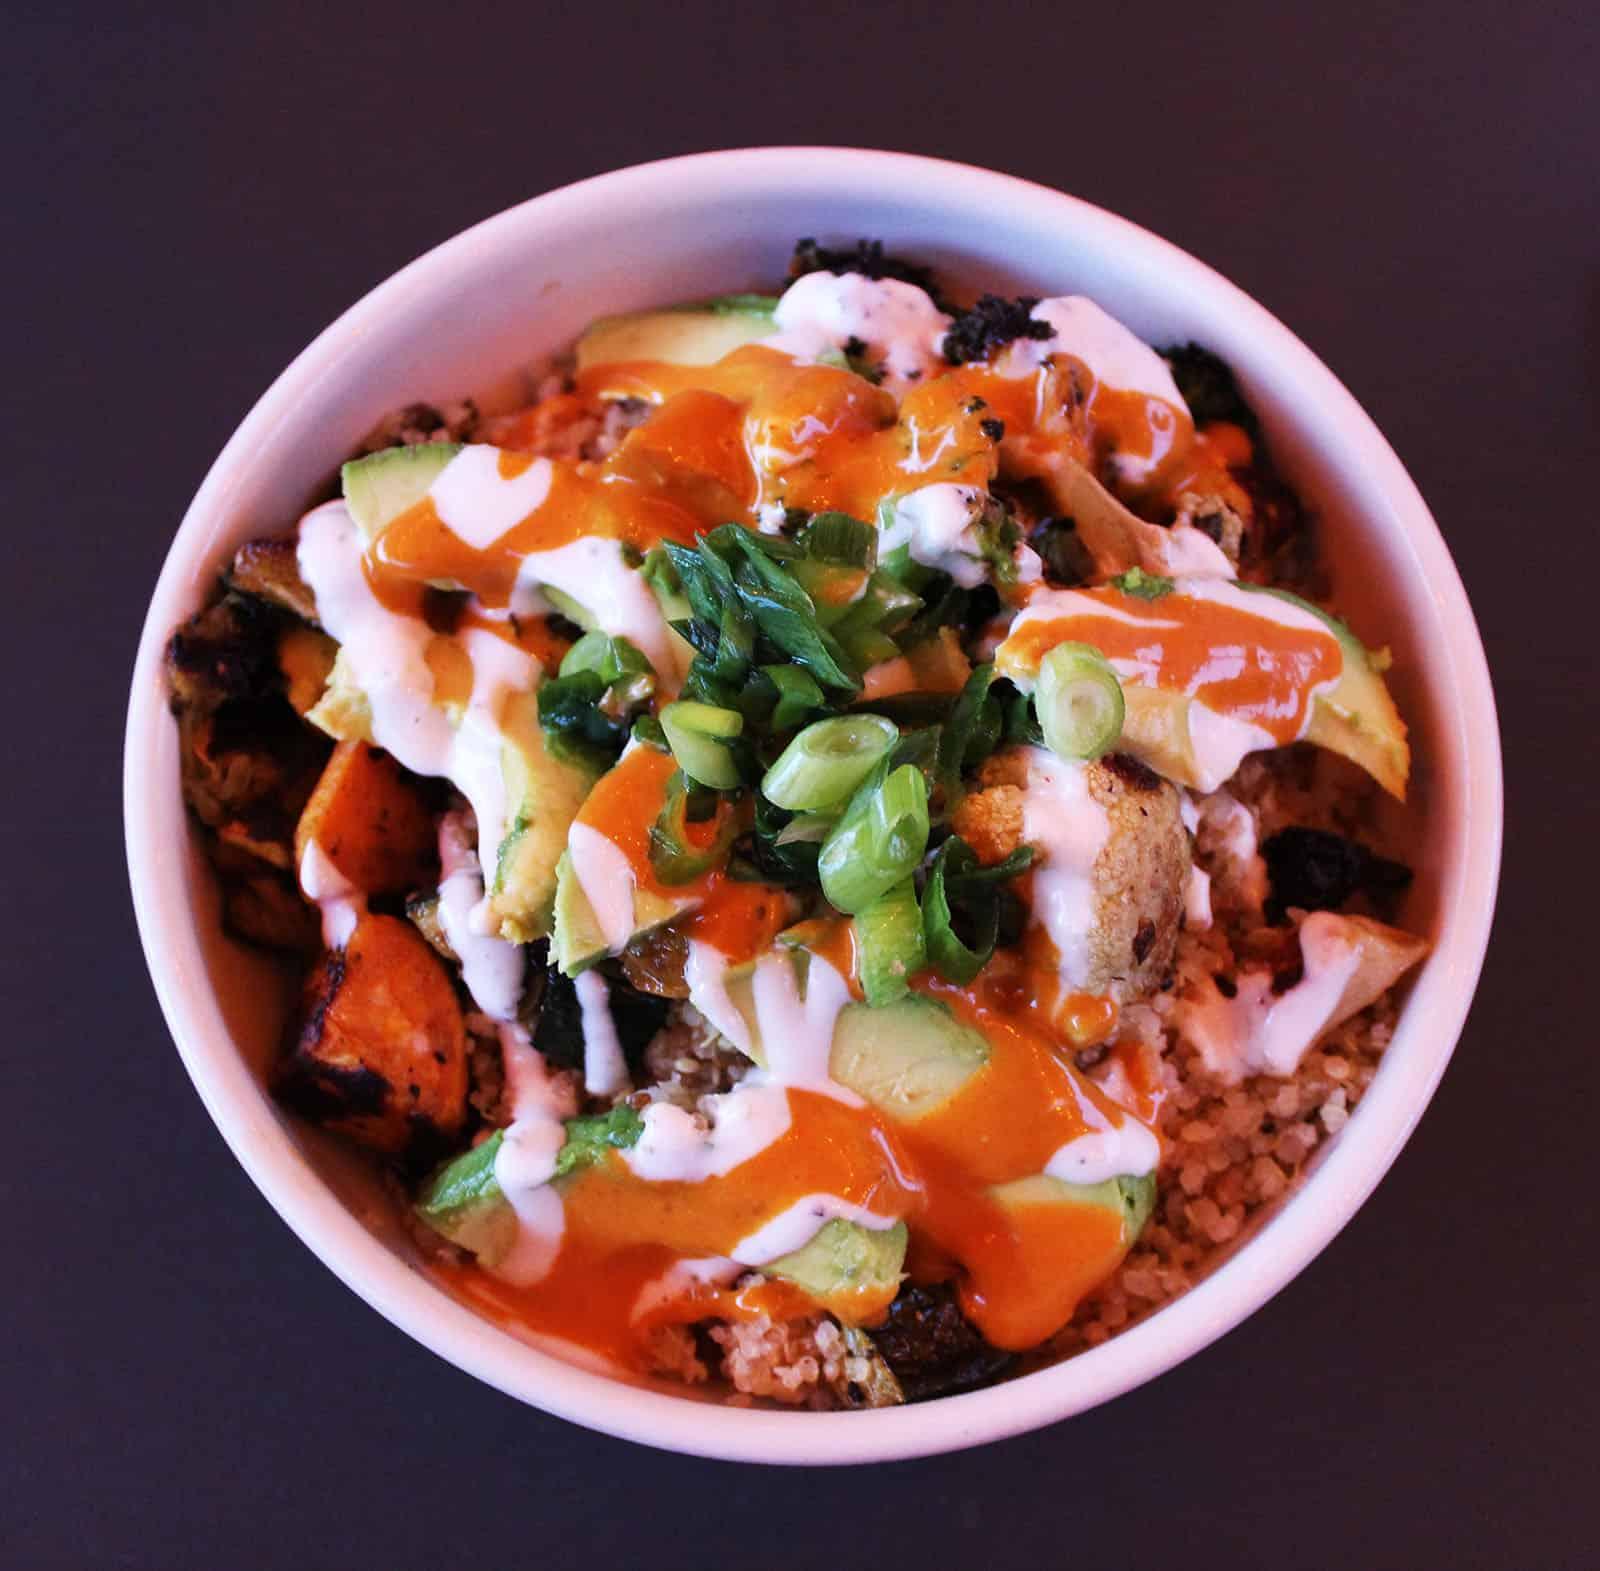 Green Kitchen Vegan Cafe: Fort Lauderdale Vegan Restaurant